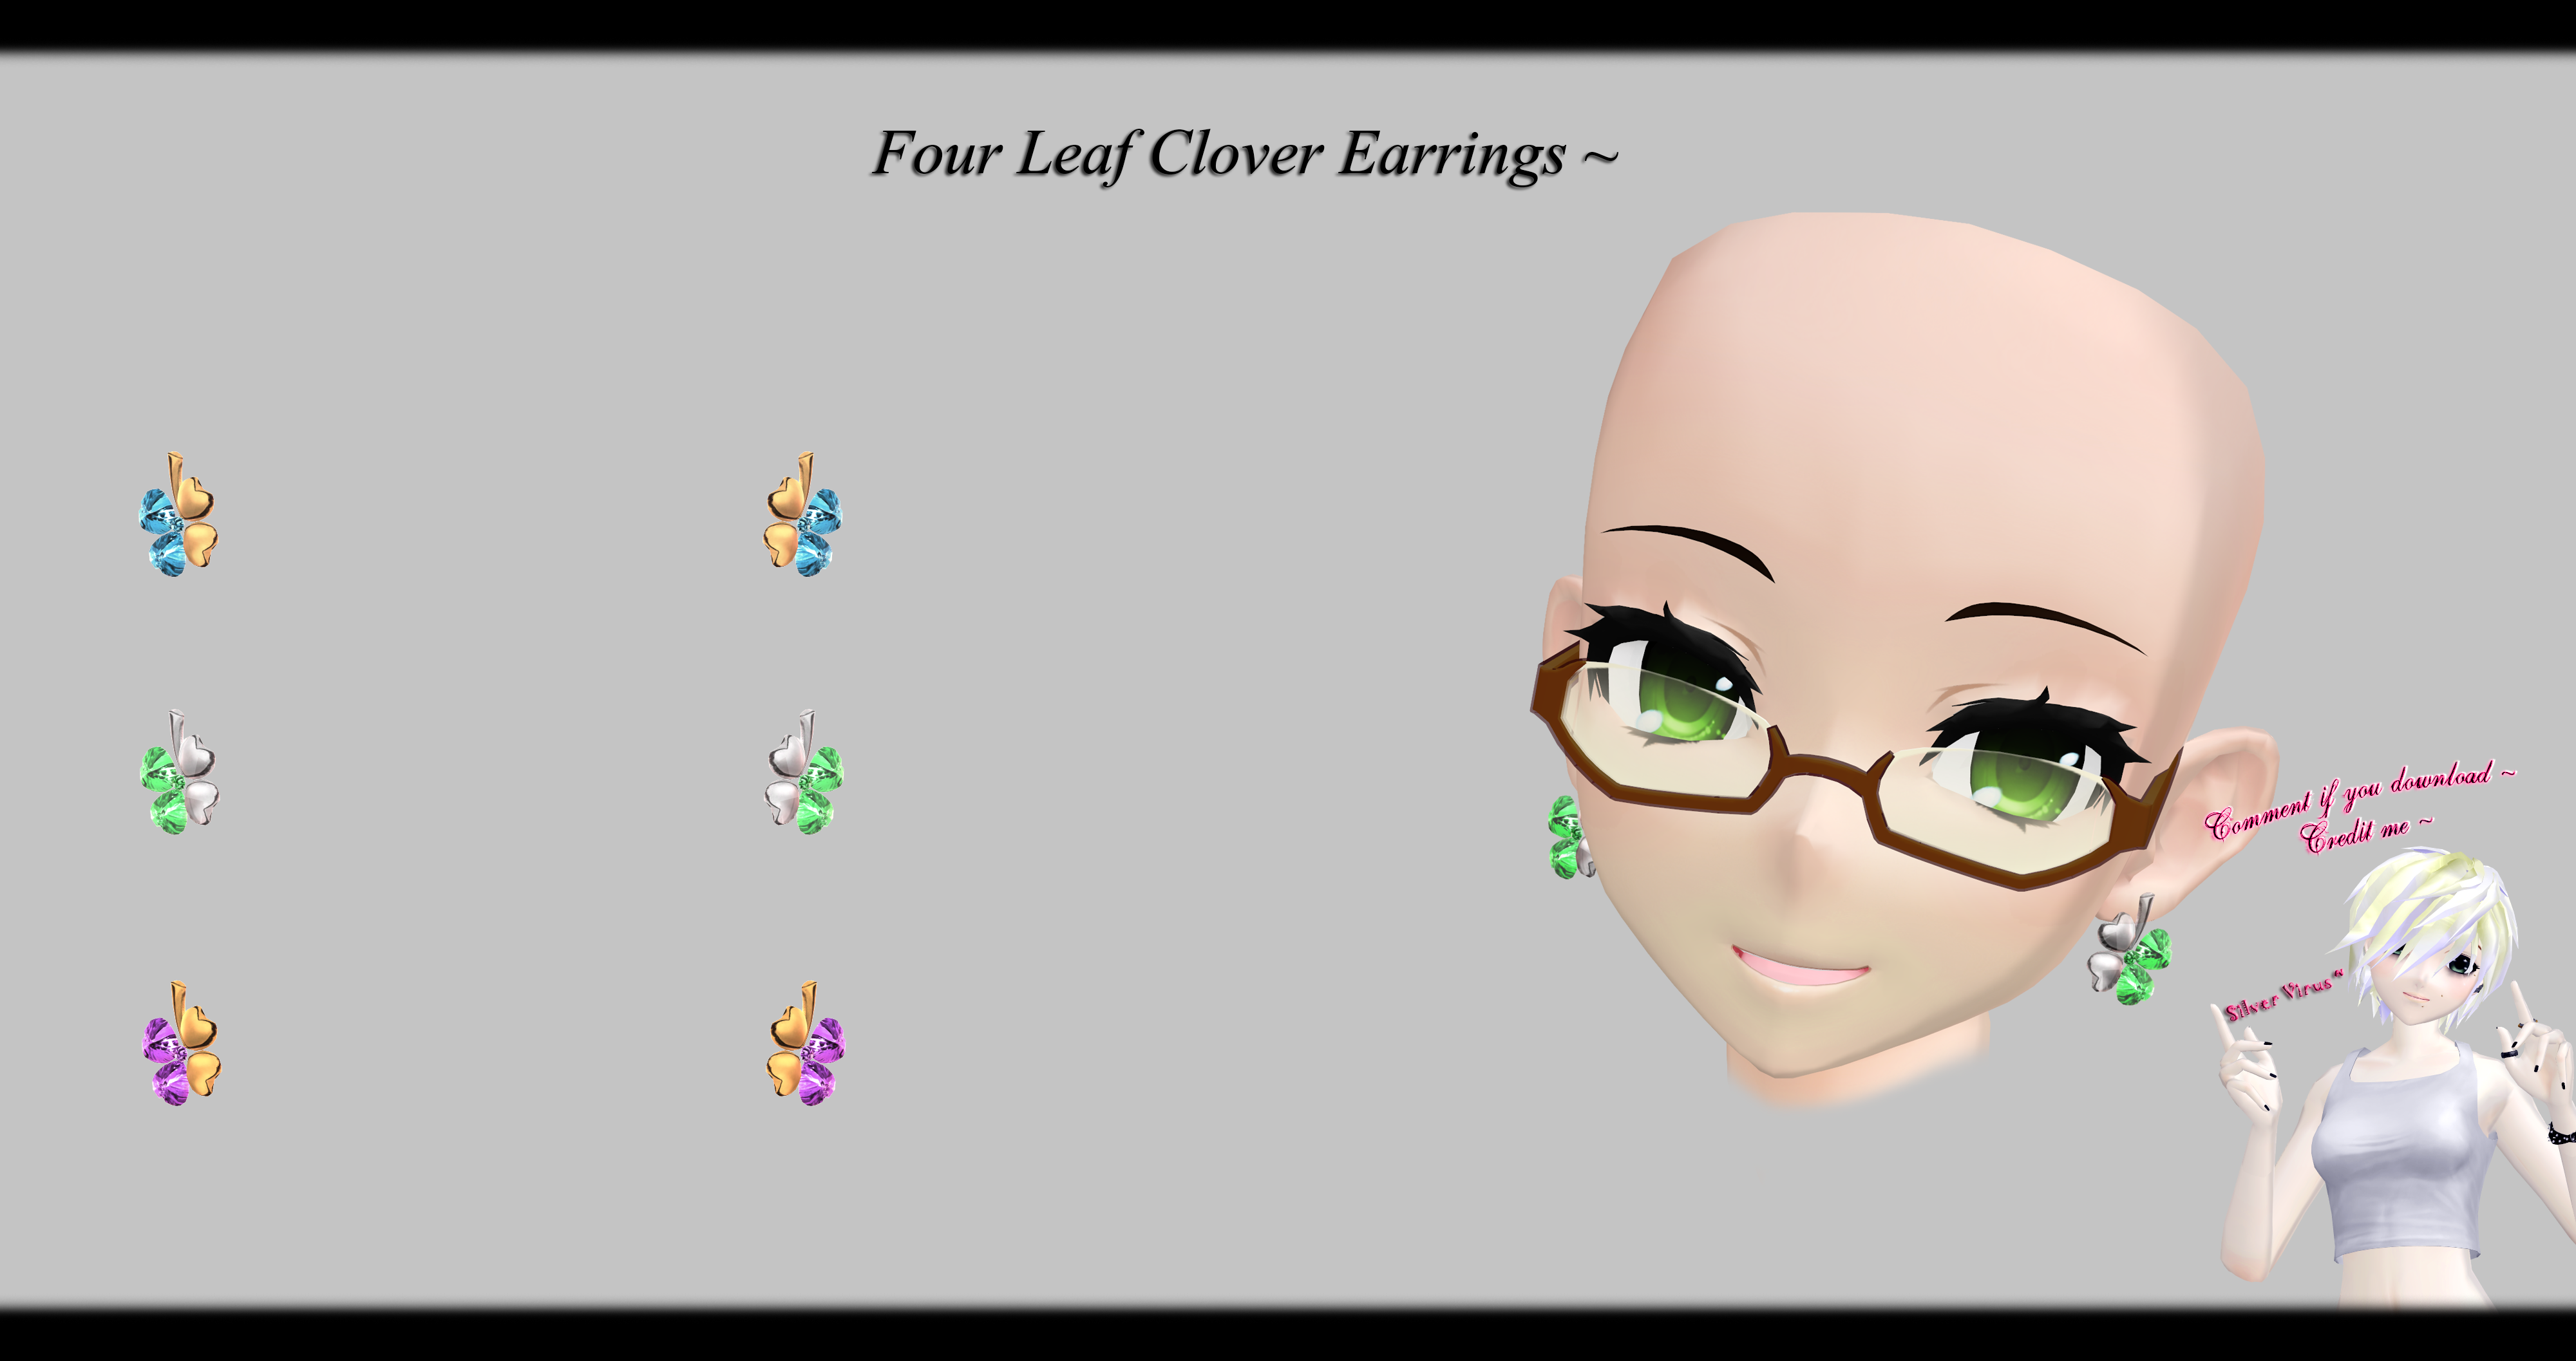 mmd four leaf clover earrings dl by o dsv o on deviantart